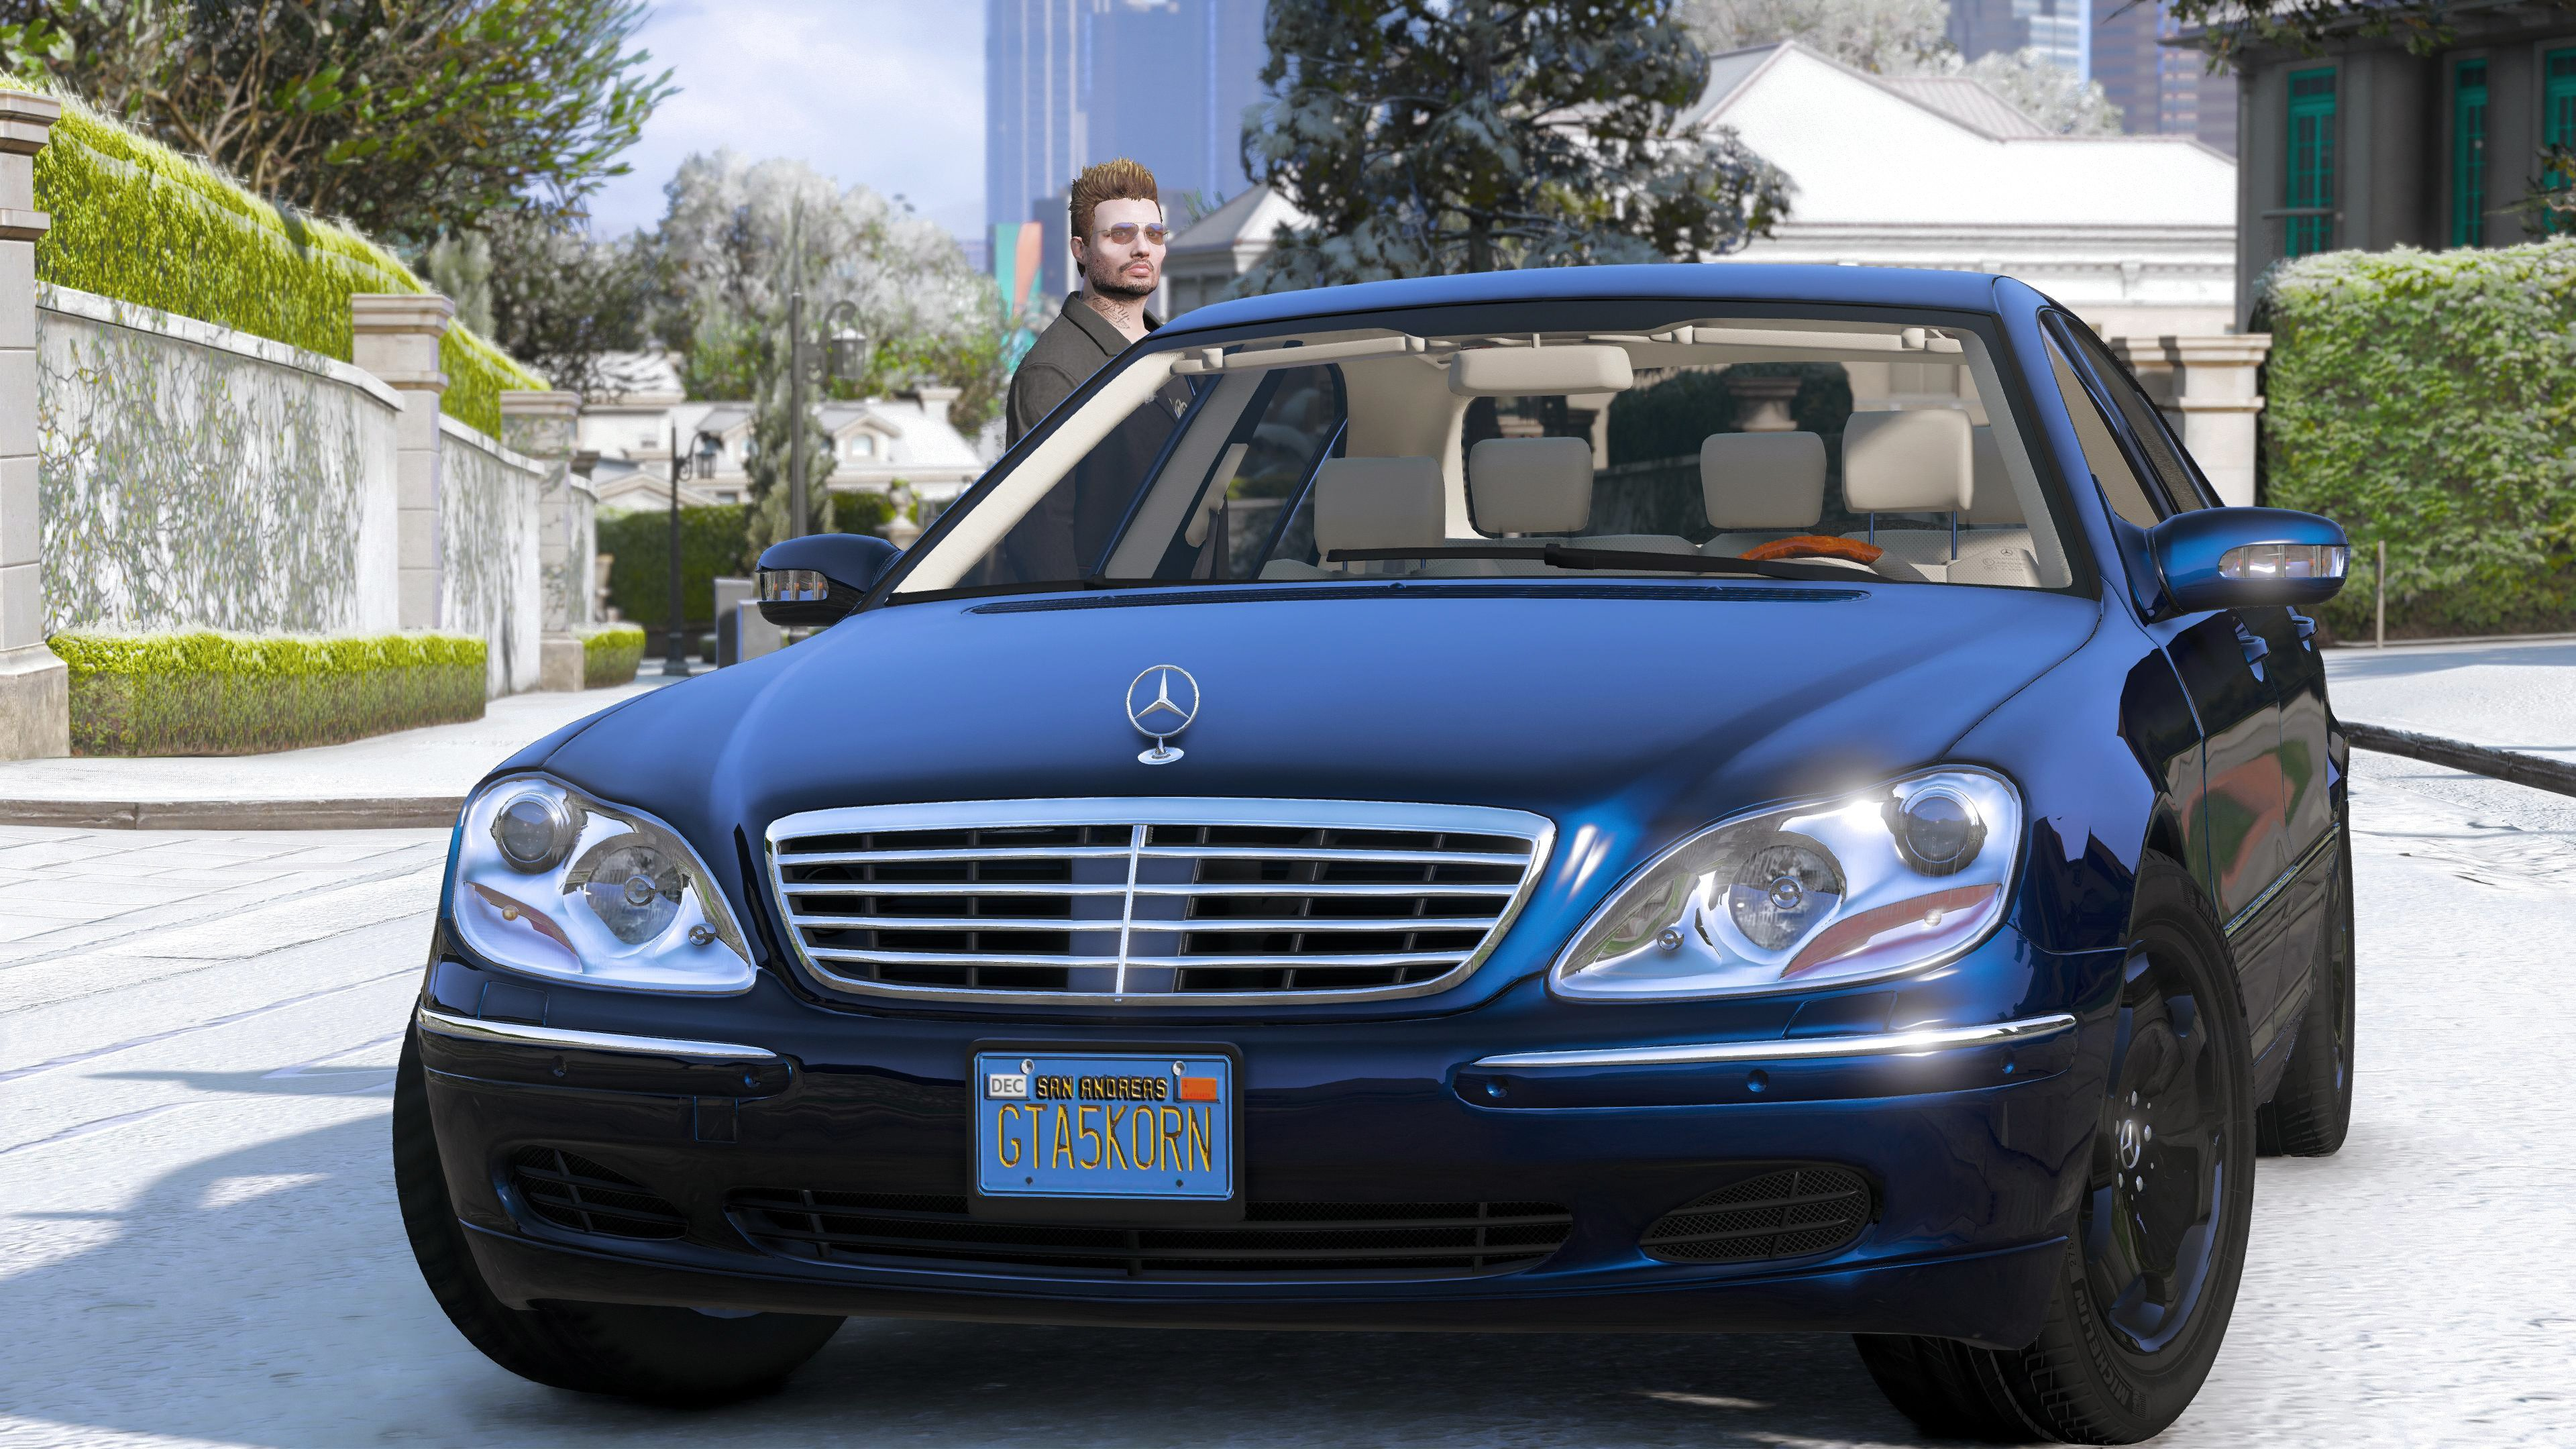 Mercedes benz s600 w220 v hicules t l chargements gta 5 for Mercedes benz s600